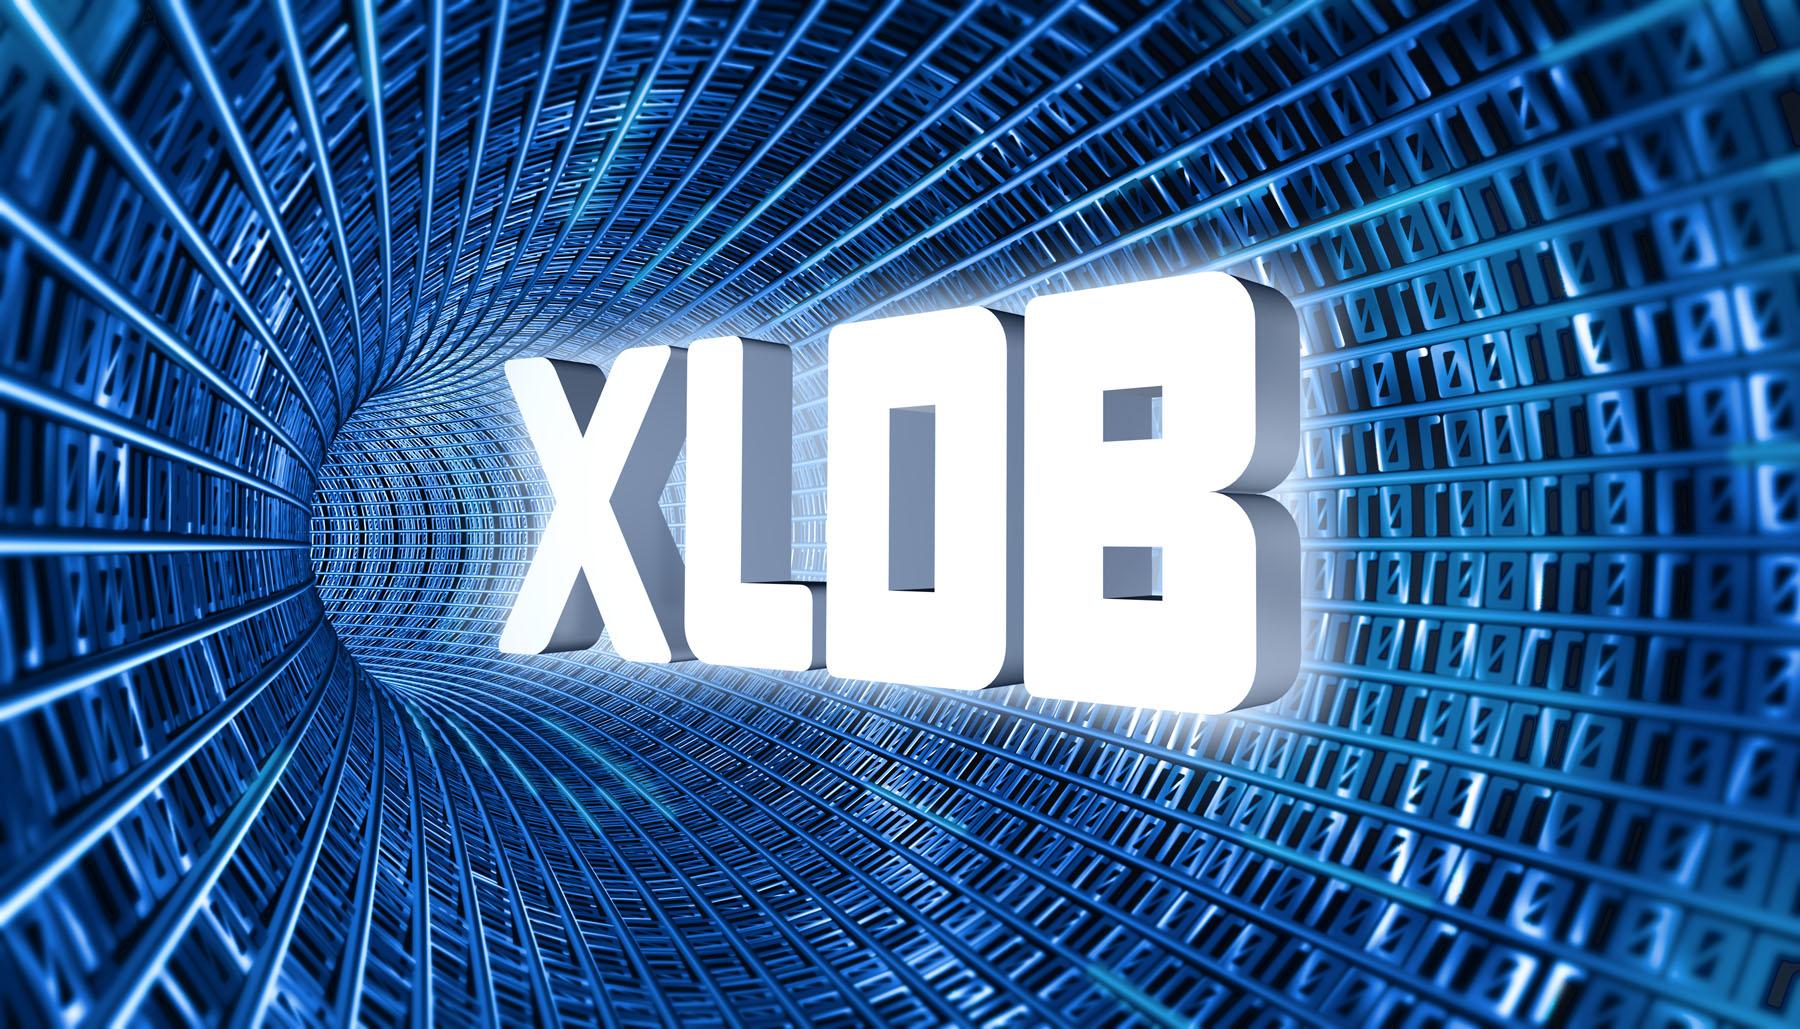 XLDB Branding